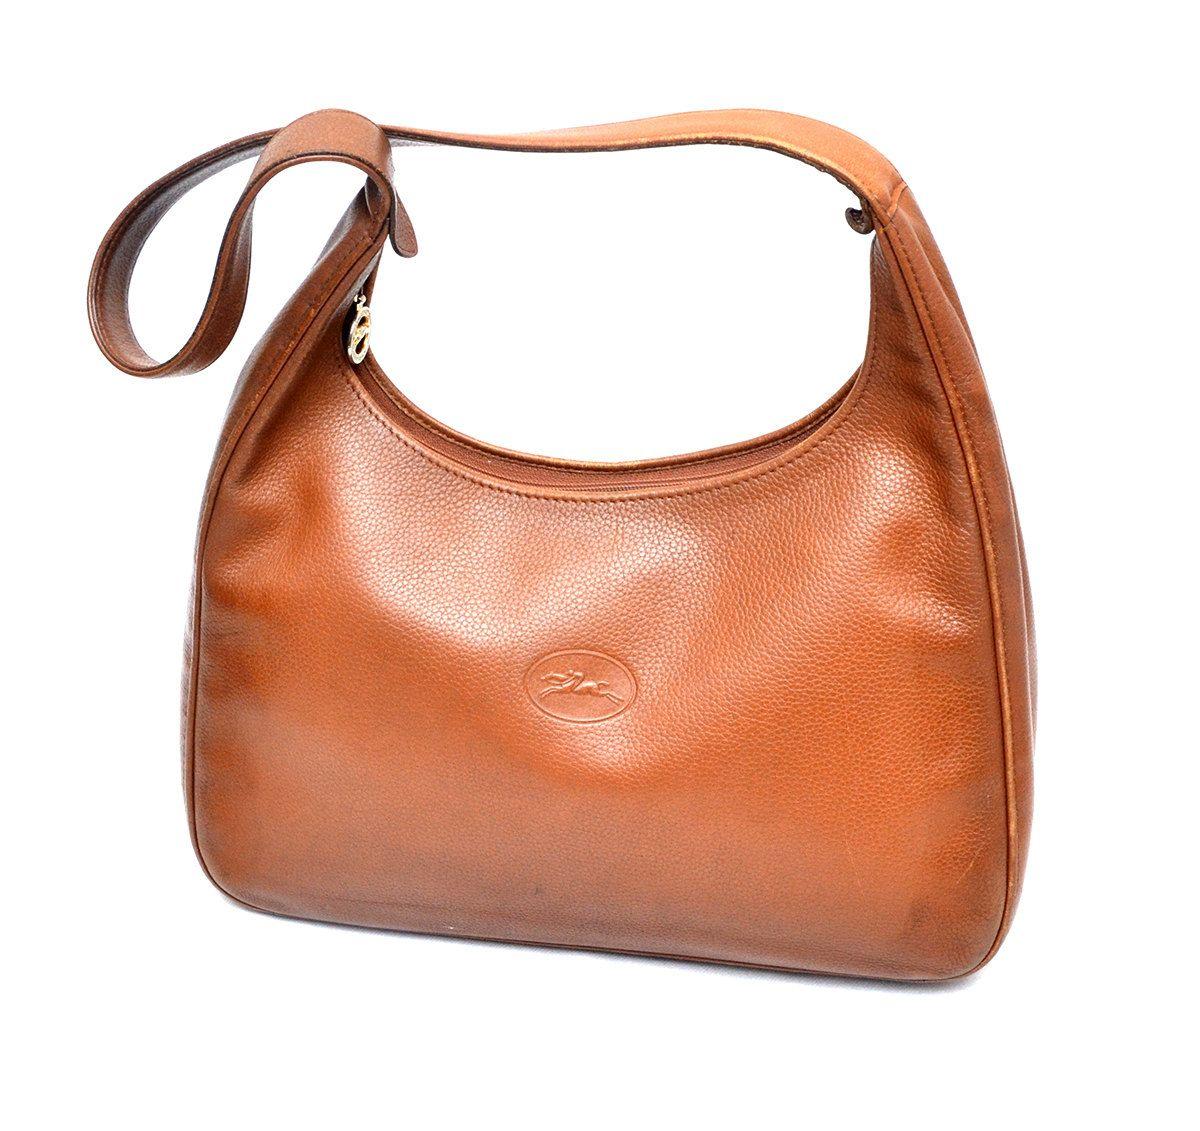 8e06fa32b5000 Authentic Longchamp Leather Shoulder Bag Hobo by MySunnyStore on Etsy